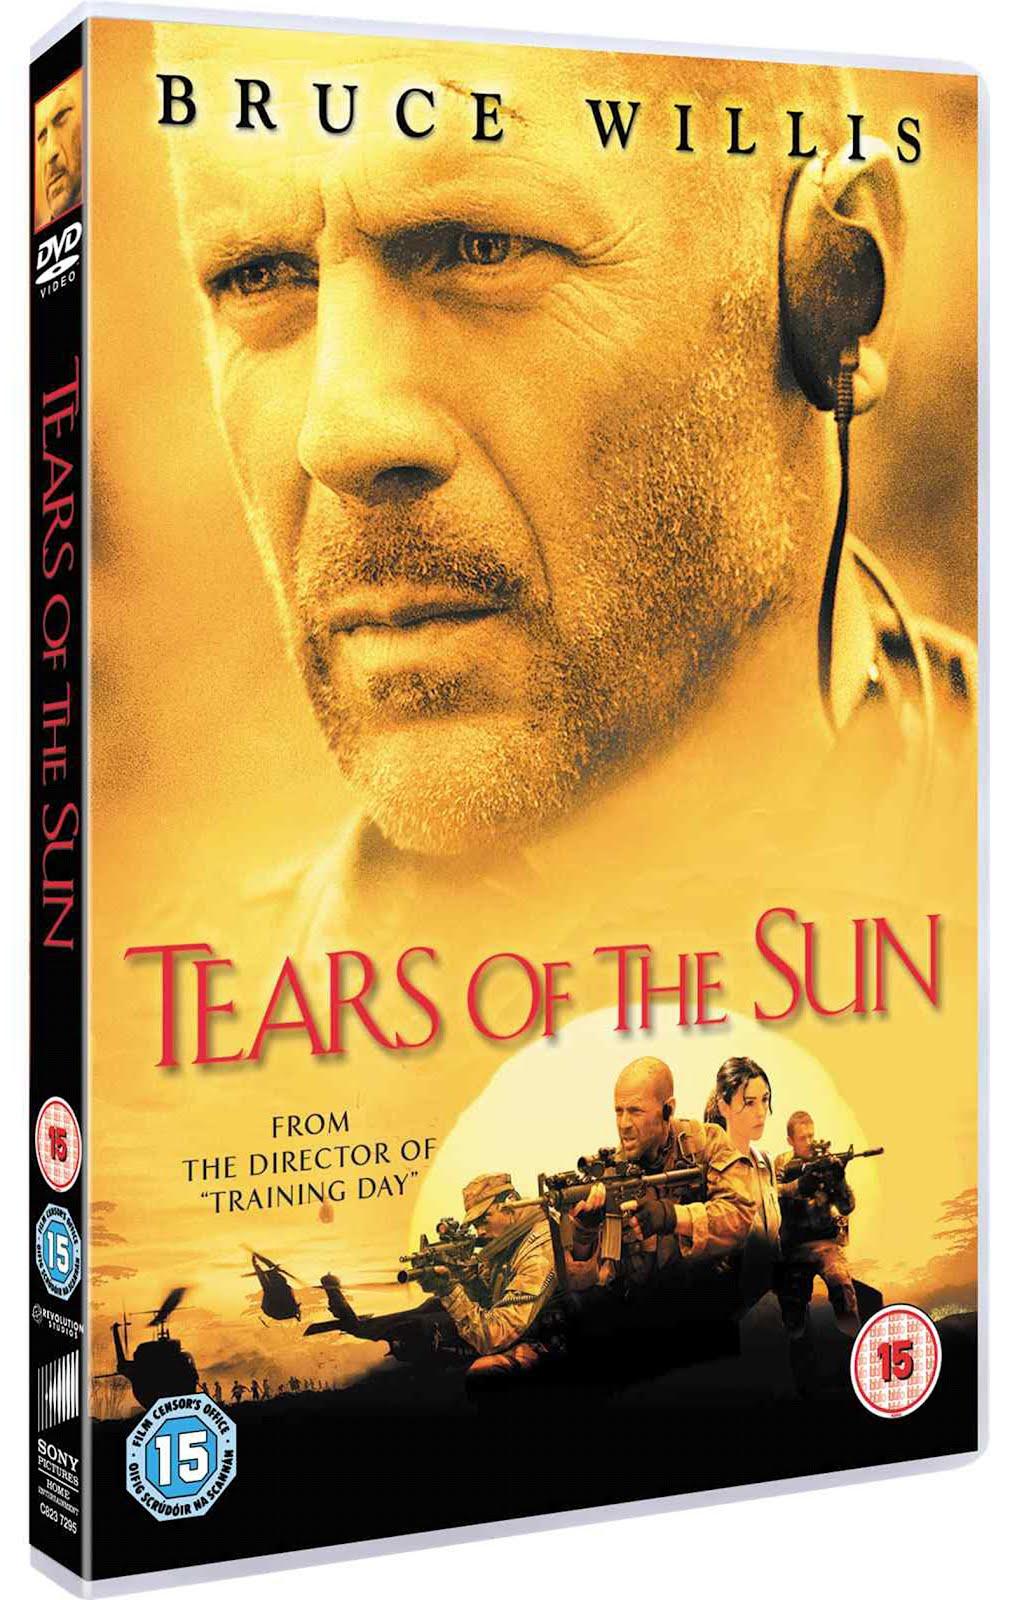 tears-of-sun-dvd-case-box